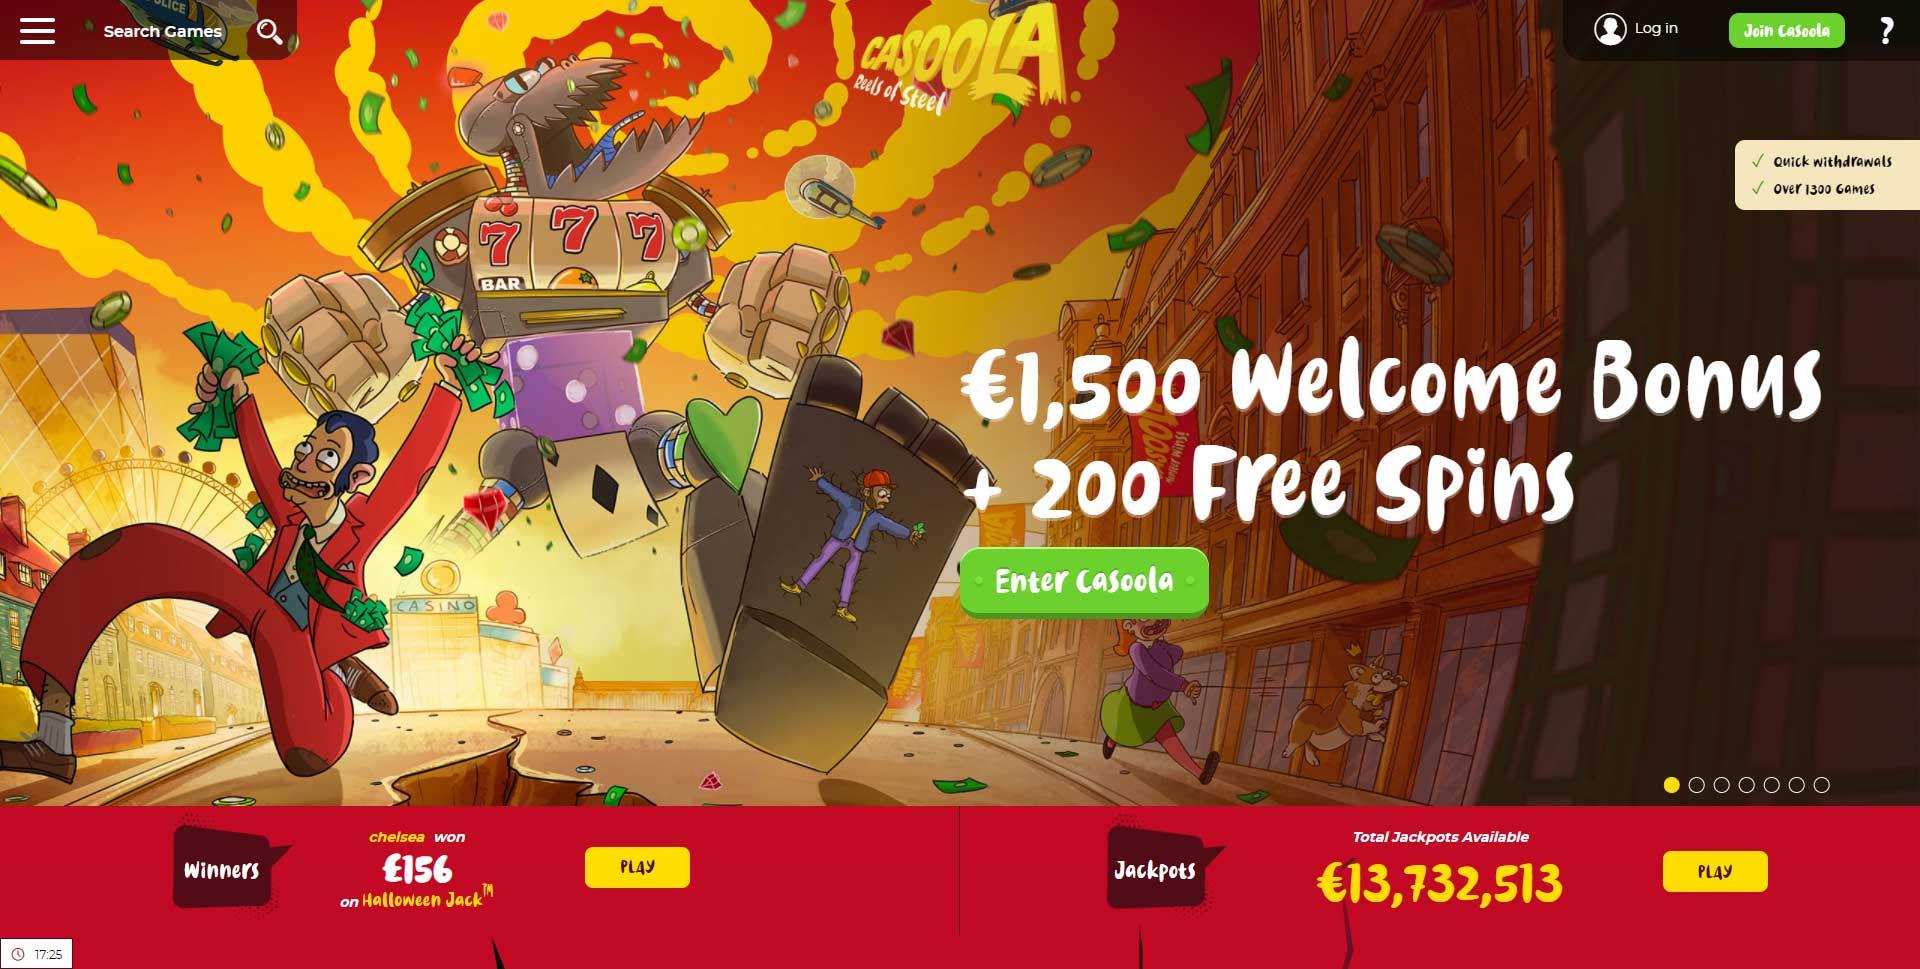 200 Free Spins at Casoola Casino